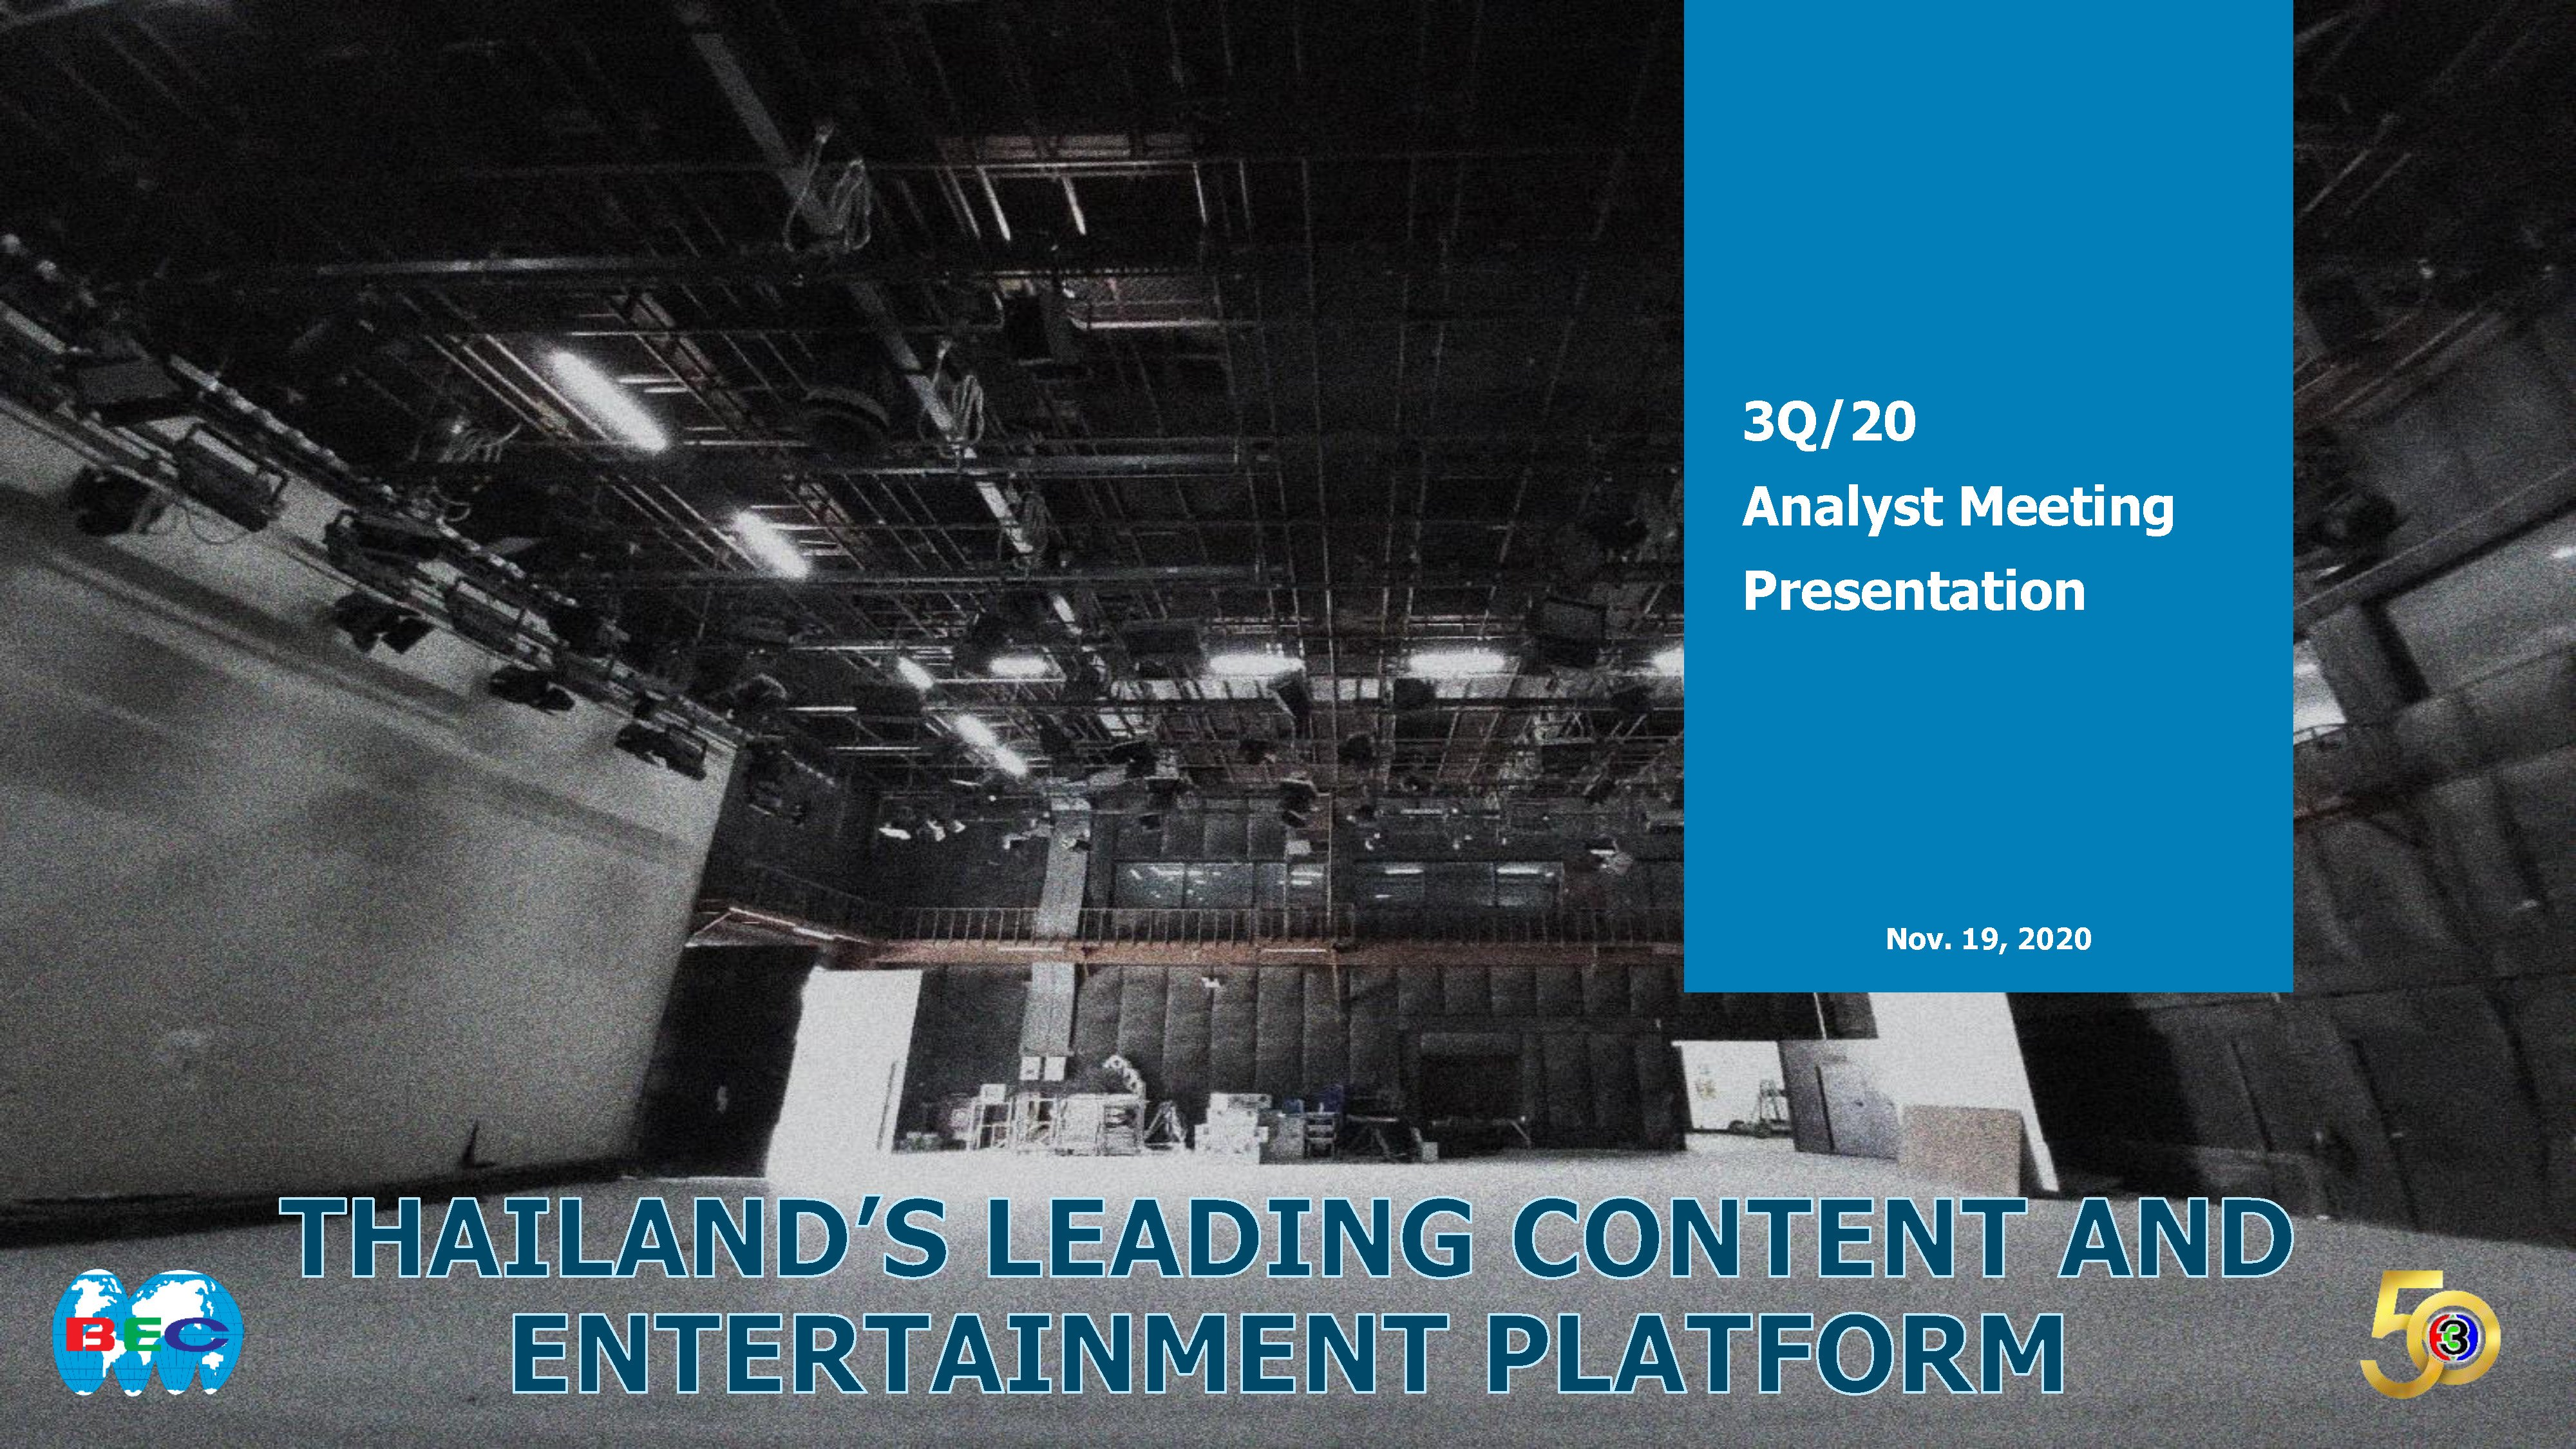 3Q/20 Analyst Meeting Presentation